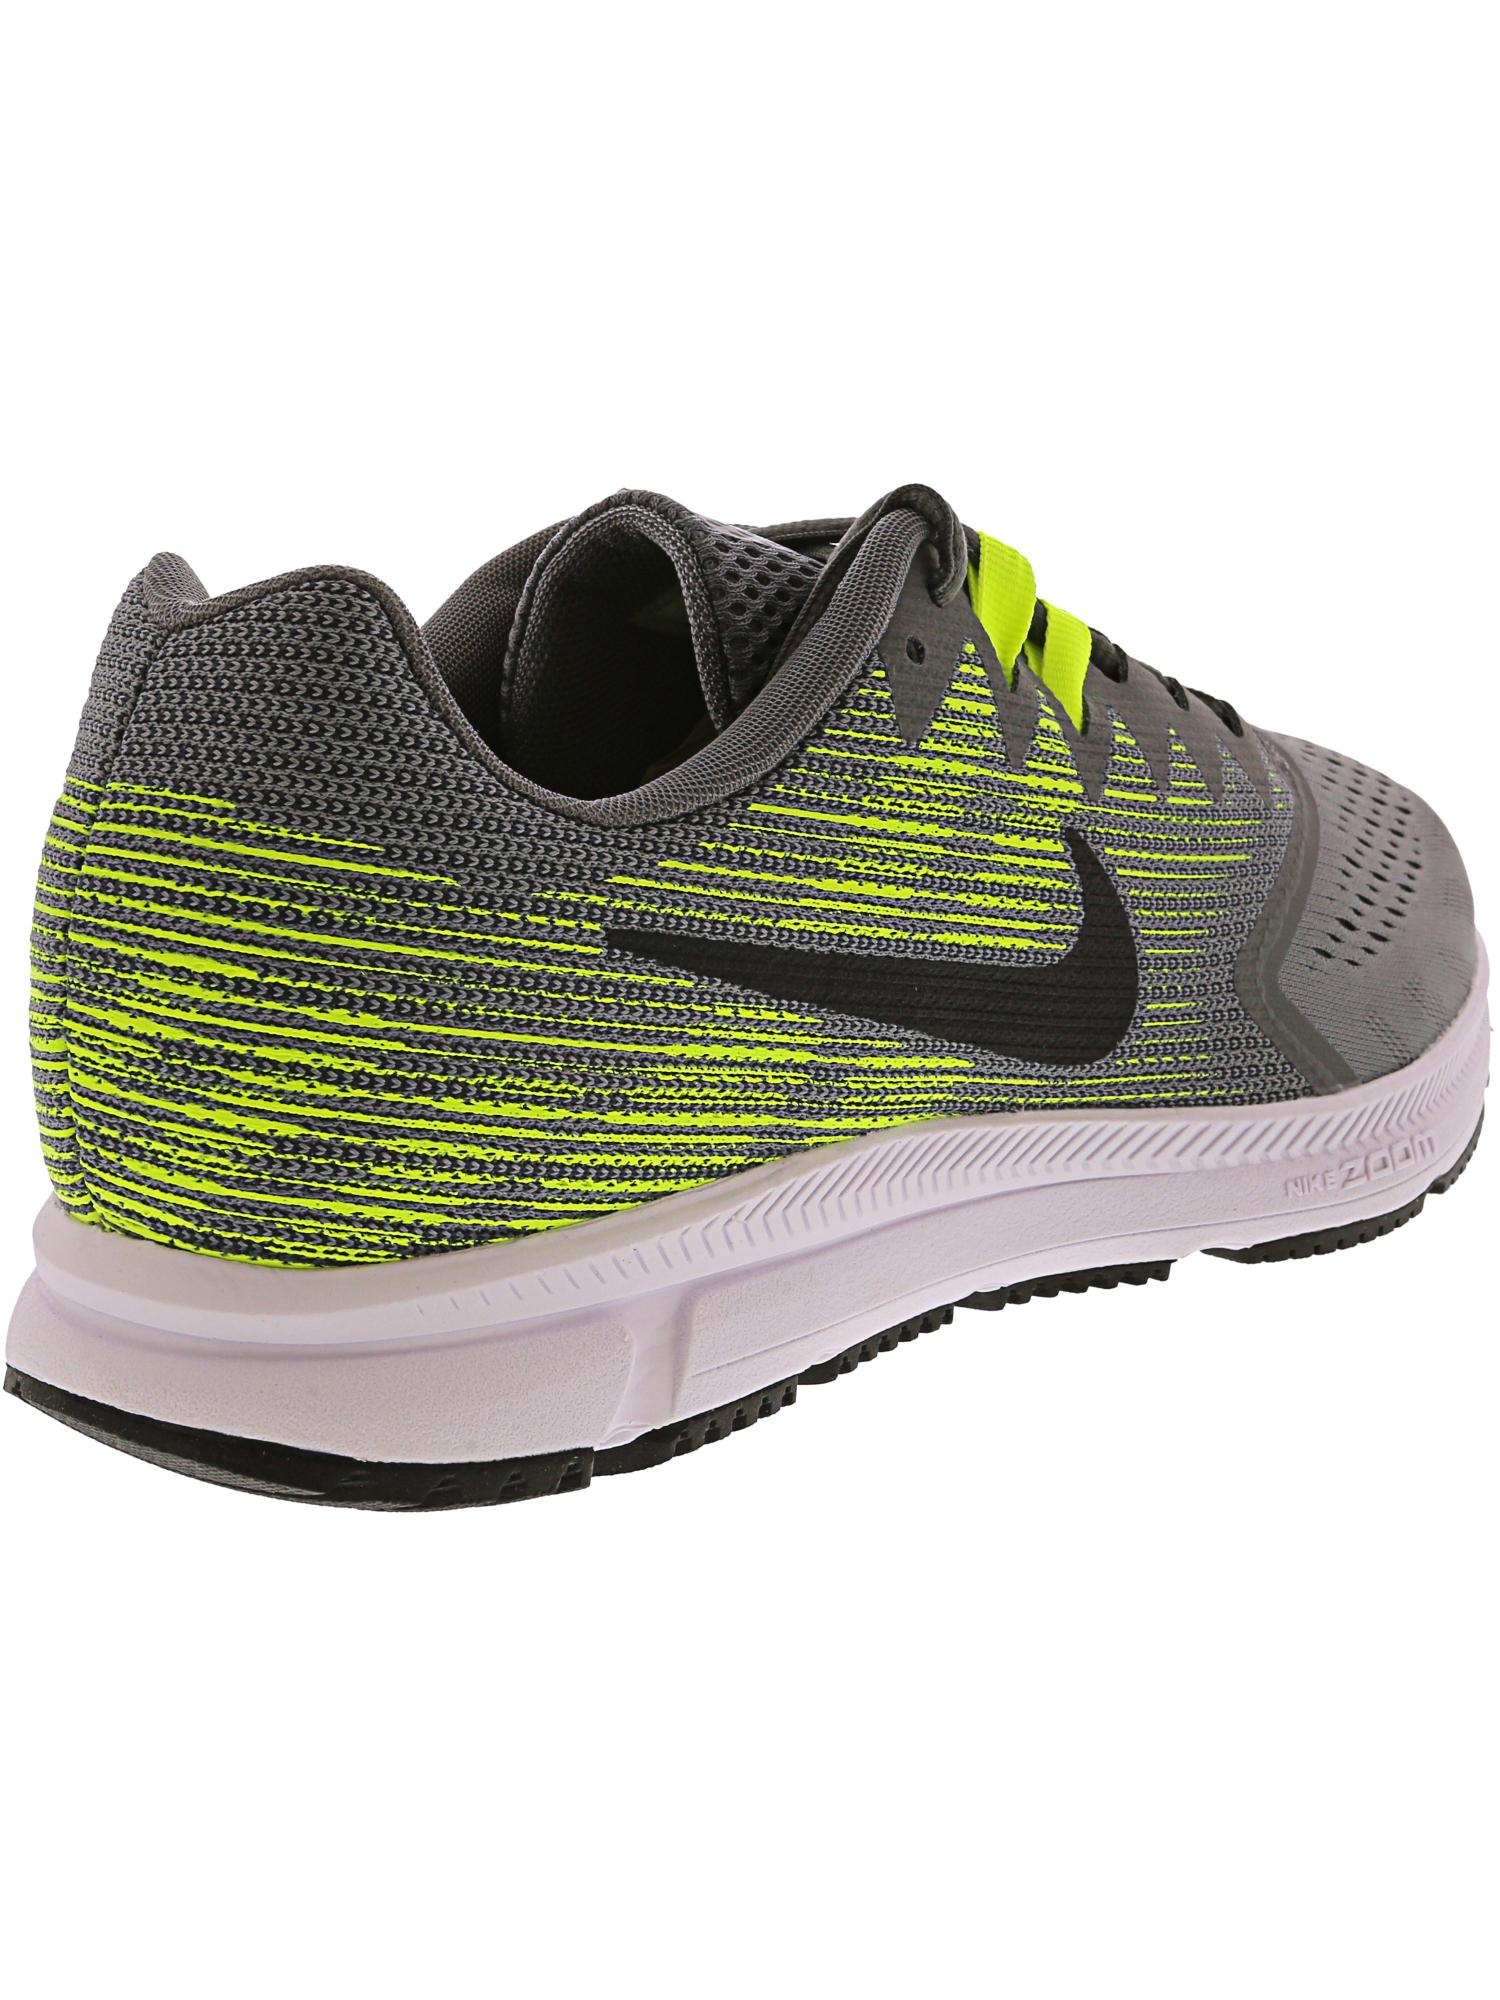 28ea455eacd Image is loading Nike-Men-039-s-Zoom-Span-2-Ankle-